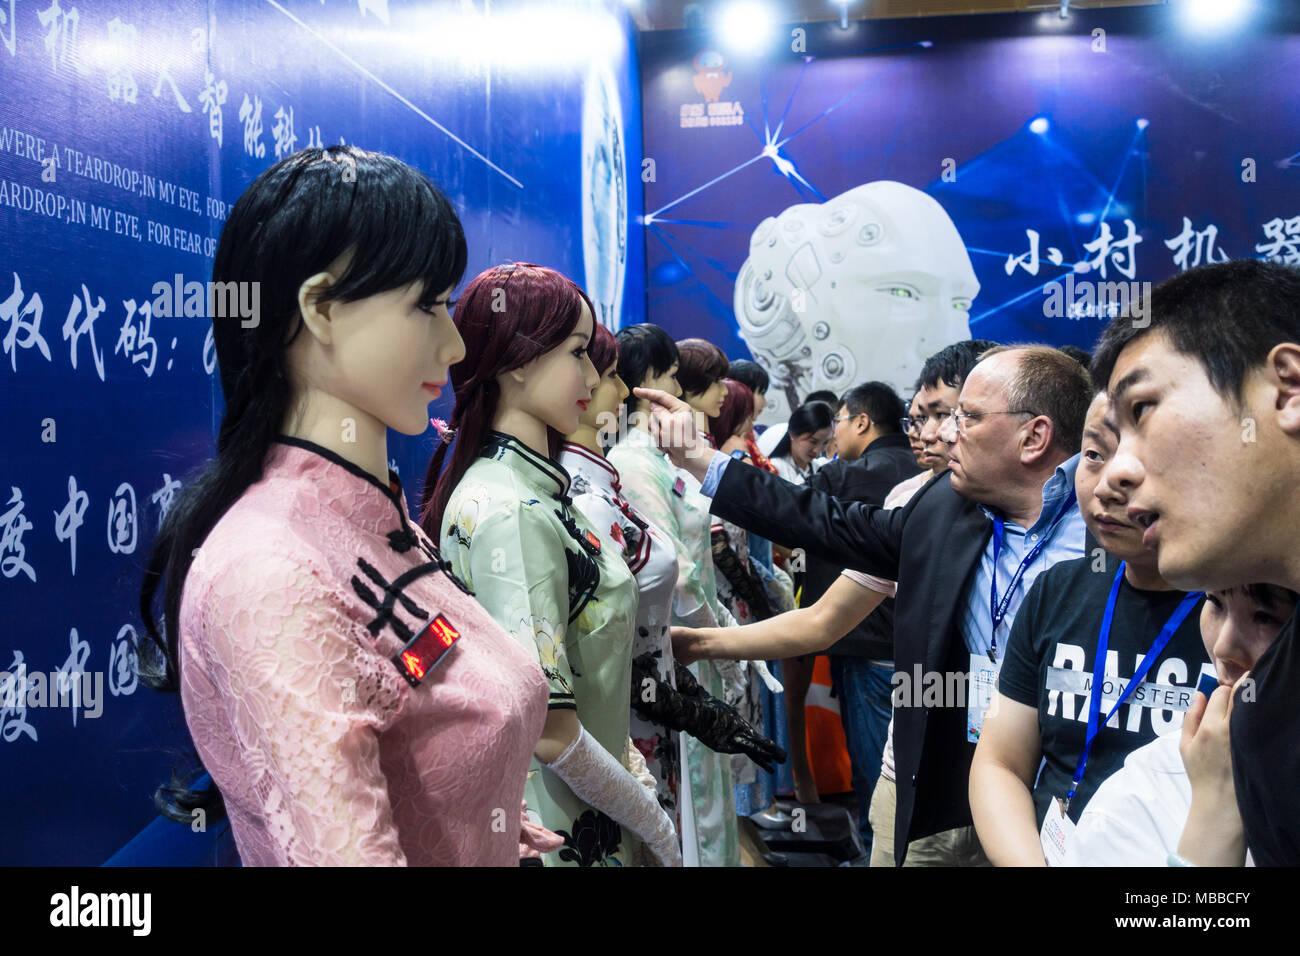 Human-like robot (humanoid robot) exhibit at technology fair in Shenzhen, China. - Stock Image